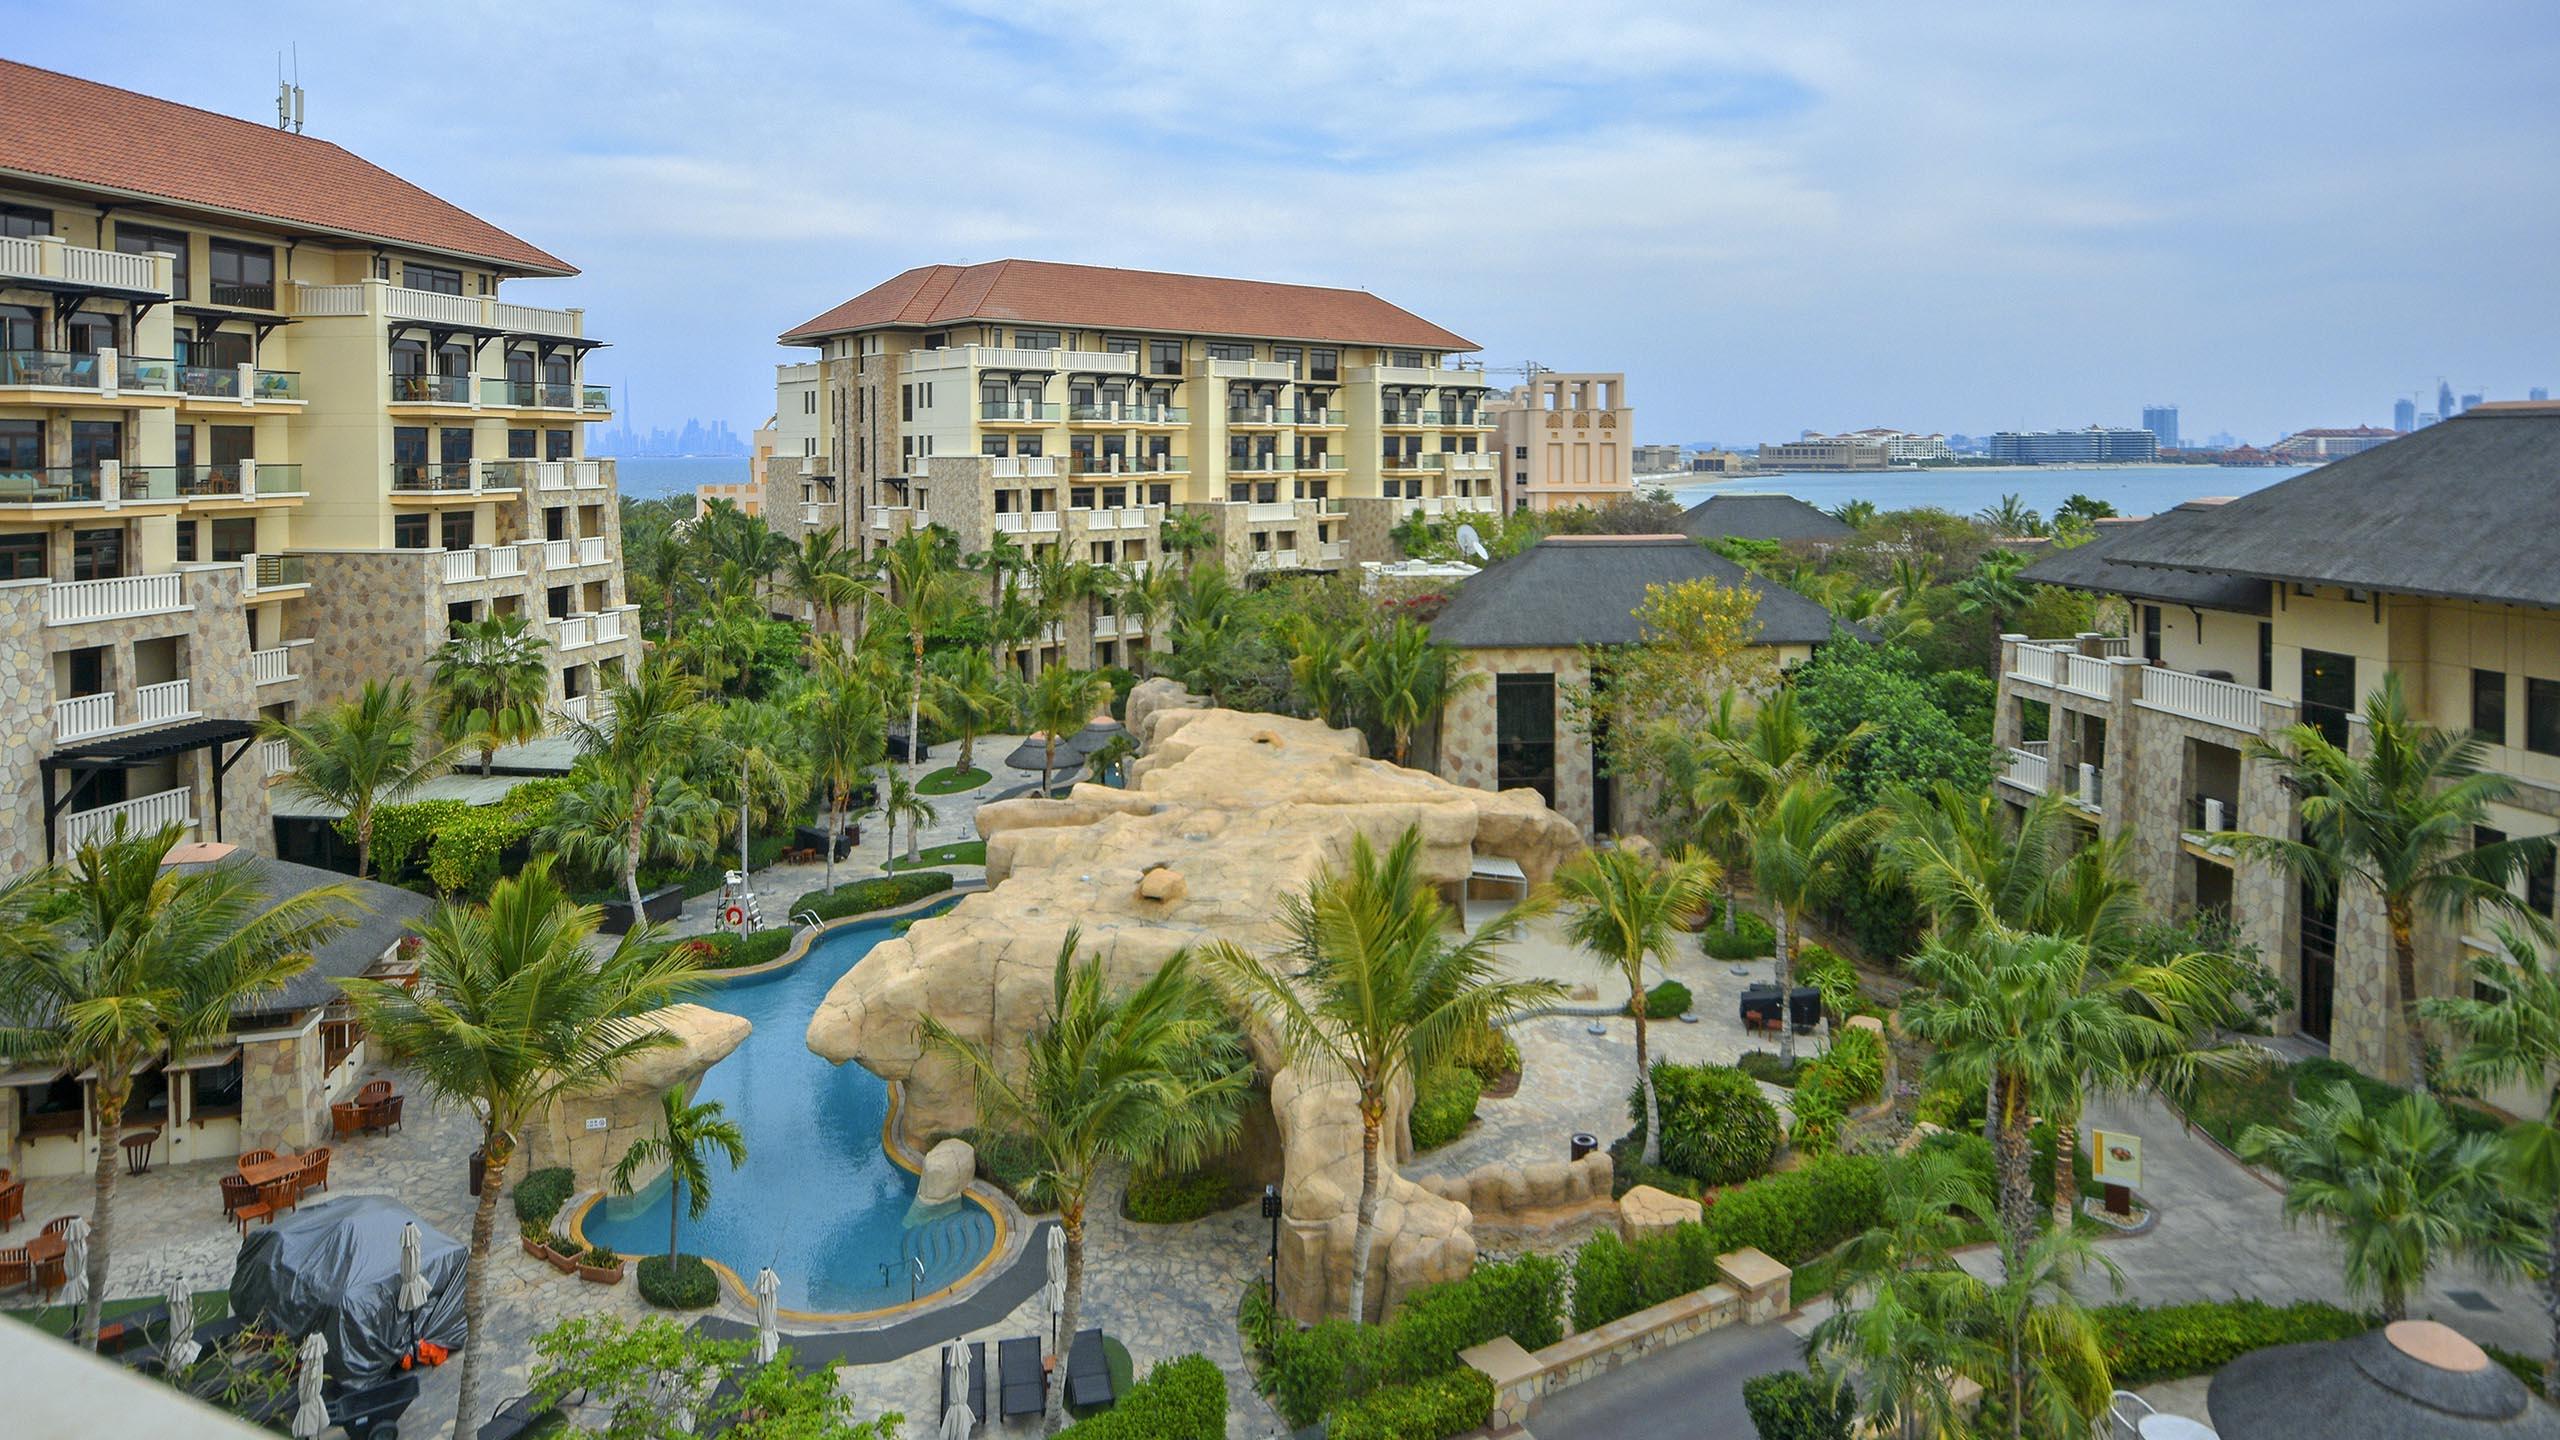 Luxury Hotel Dubai Sofitel Dubai The Palm Luxury Apartments